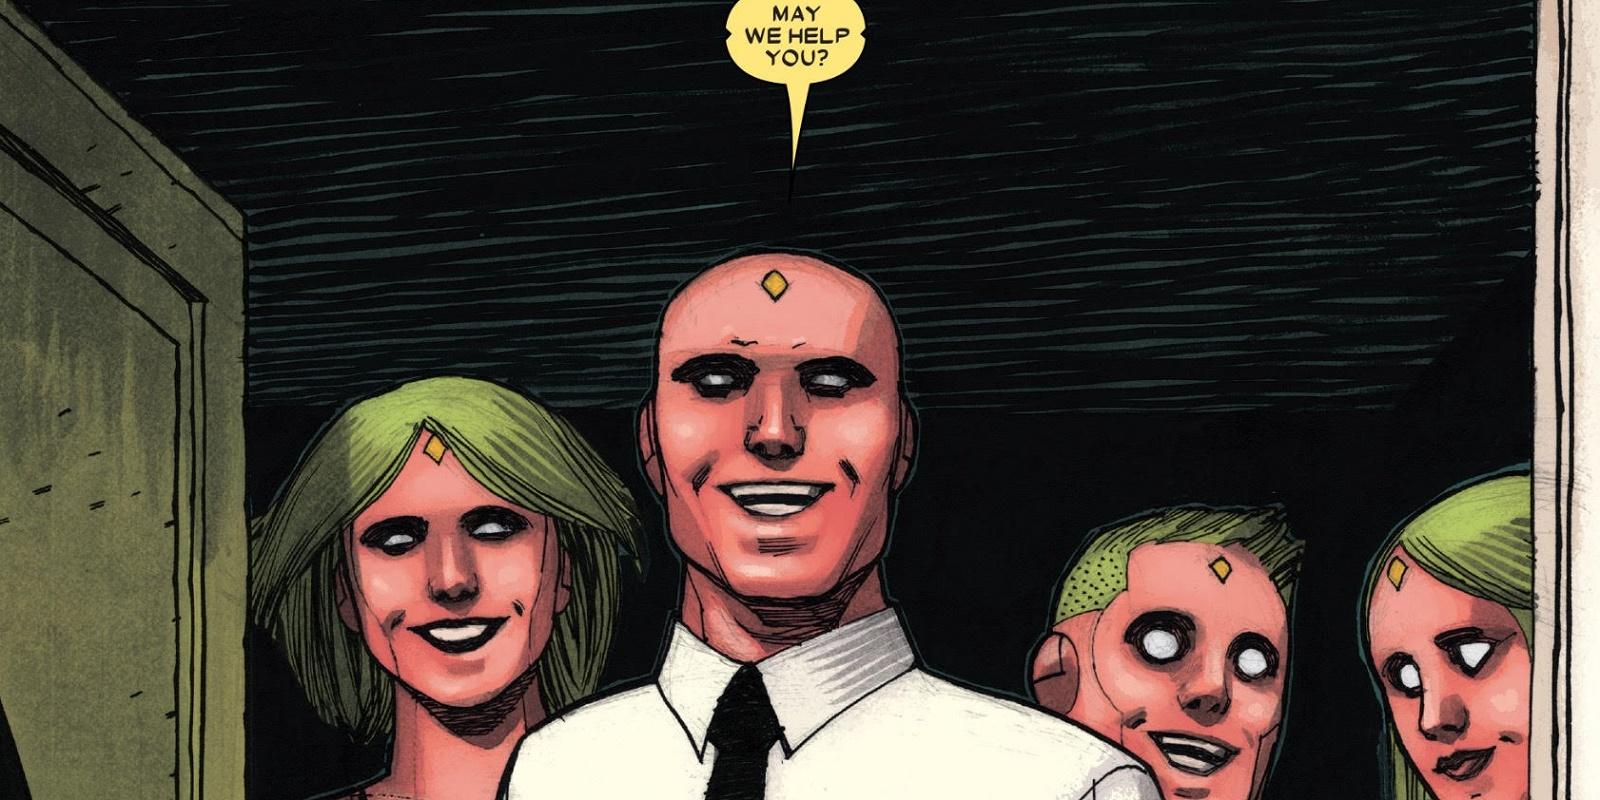 The Vision family Marvel by Gabriel Hernandez Walta Marvel Marvels Vision Comic Ends in Tragedy For [SPOILER]